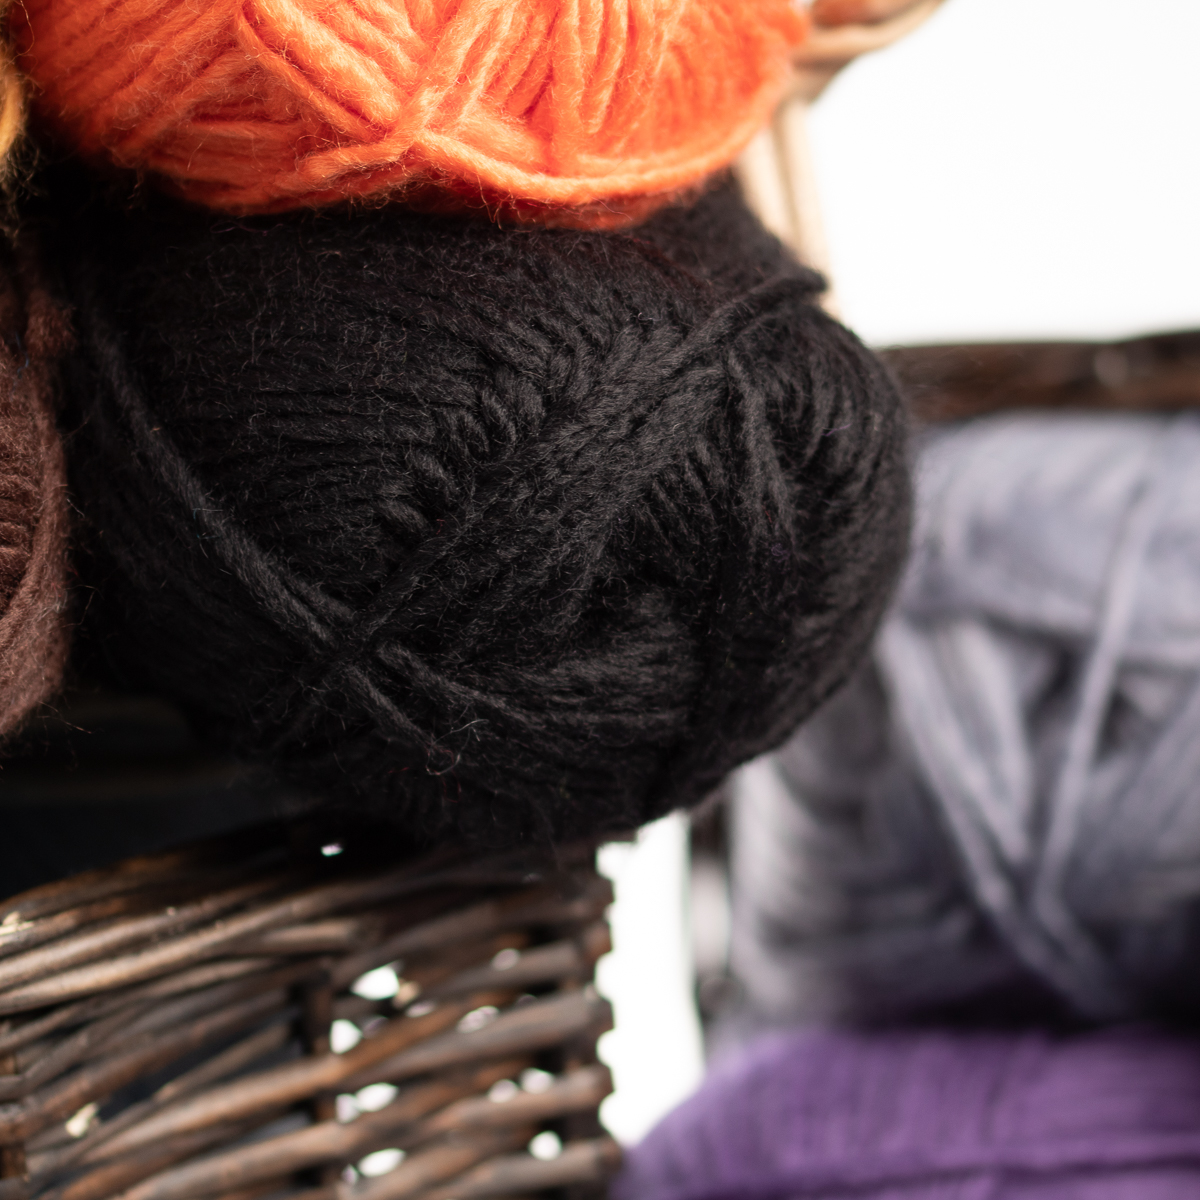 3pk-Lion-Brand-New-Basic-Acrylic-amp-Wool-Yarn-Medium-4-Knit-Crochet-Skeins-Soft thumbnail 14